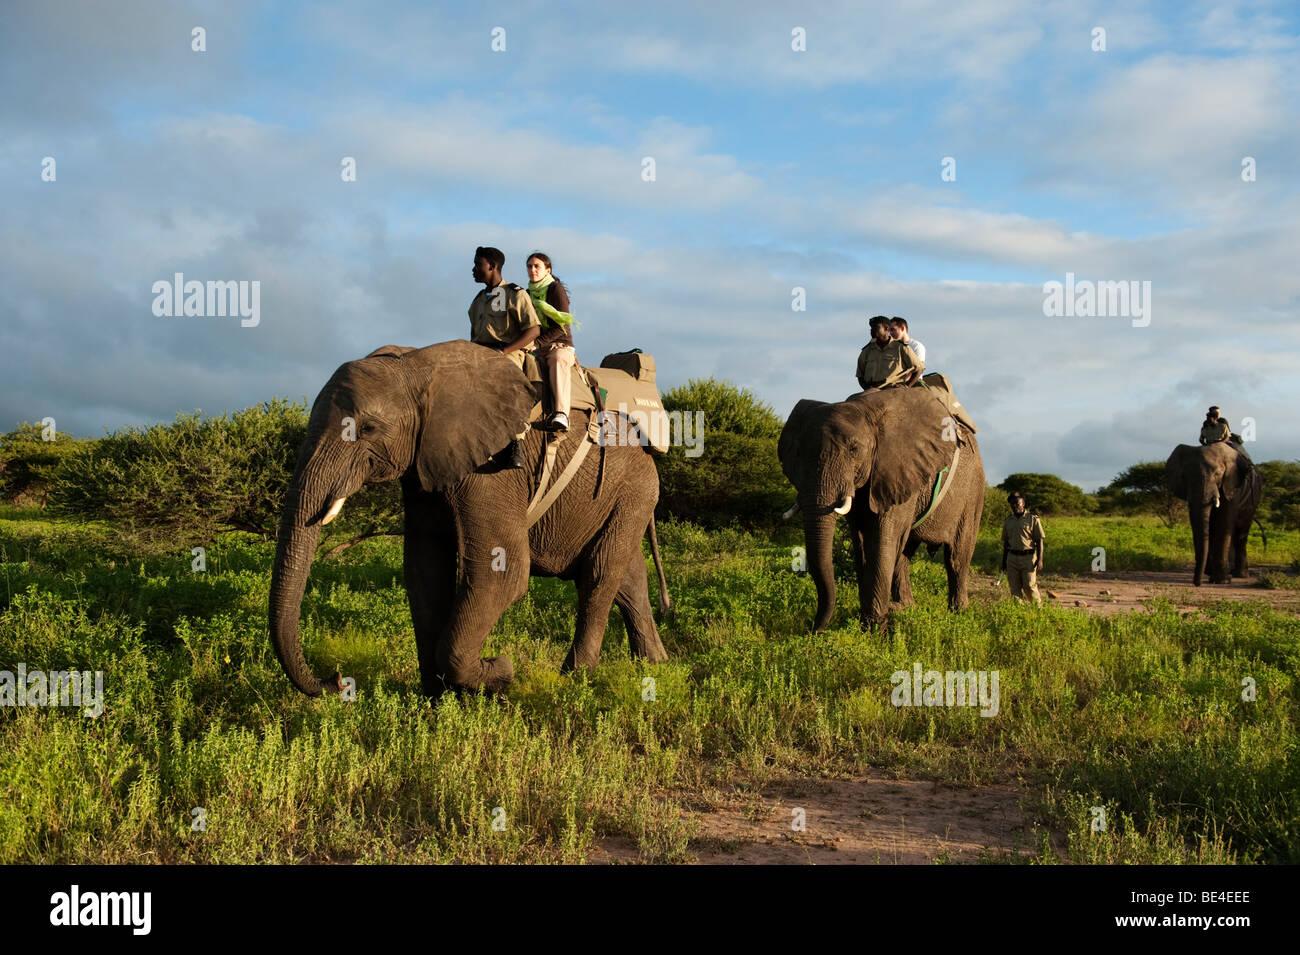 Volver Elephant Safari Kapama Game Reserve, el mayor parque nacional de Kruger, Sudáfrica Imagen De Stock